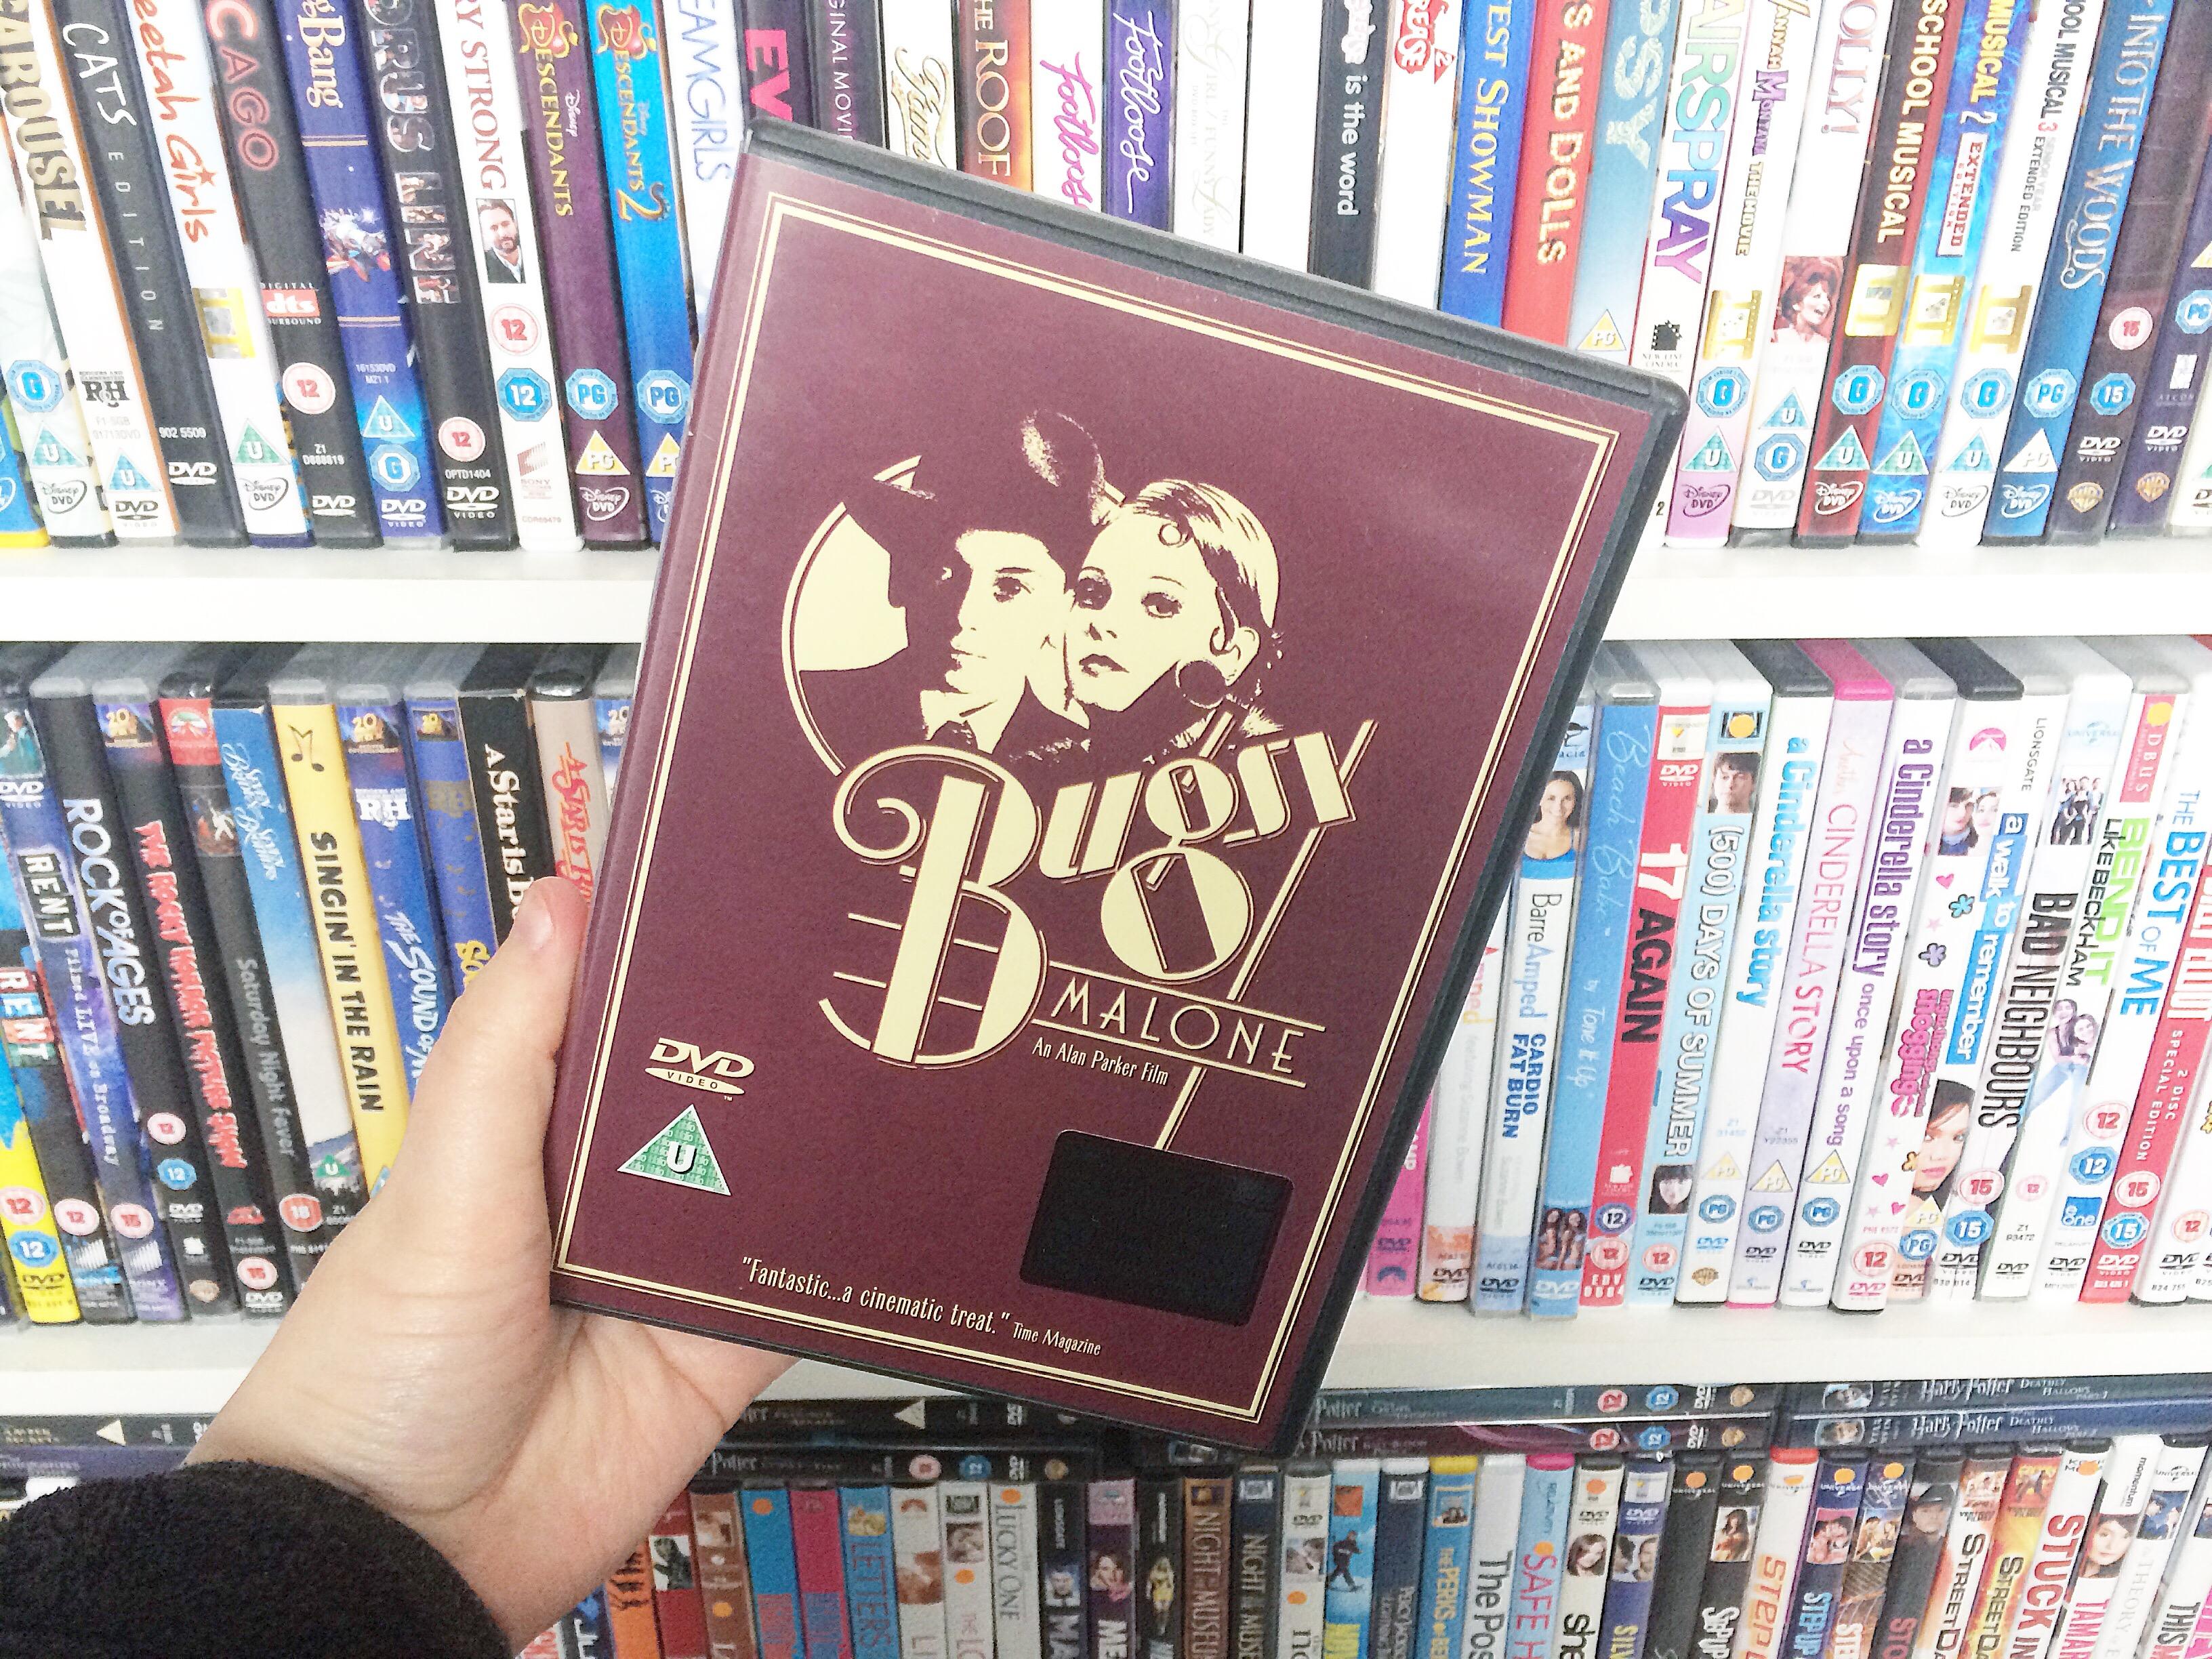 favourite-movie-musicals-bugsy-malone